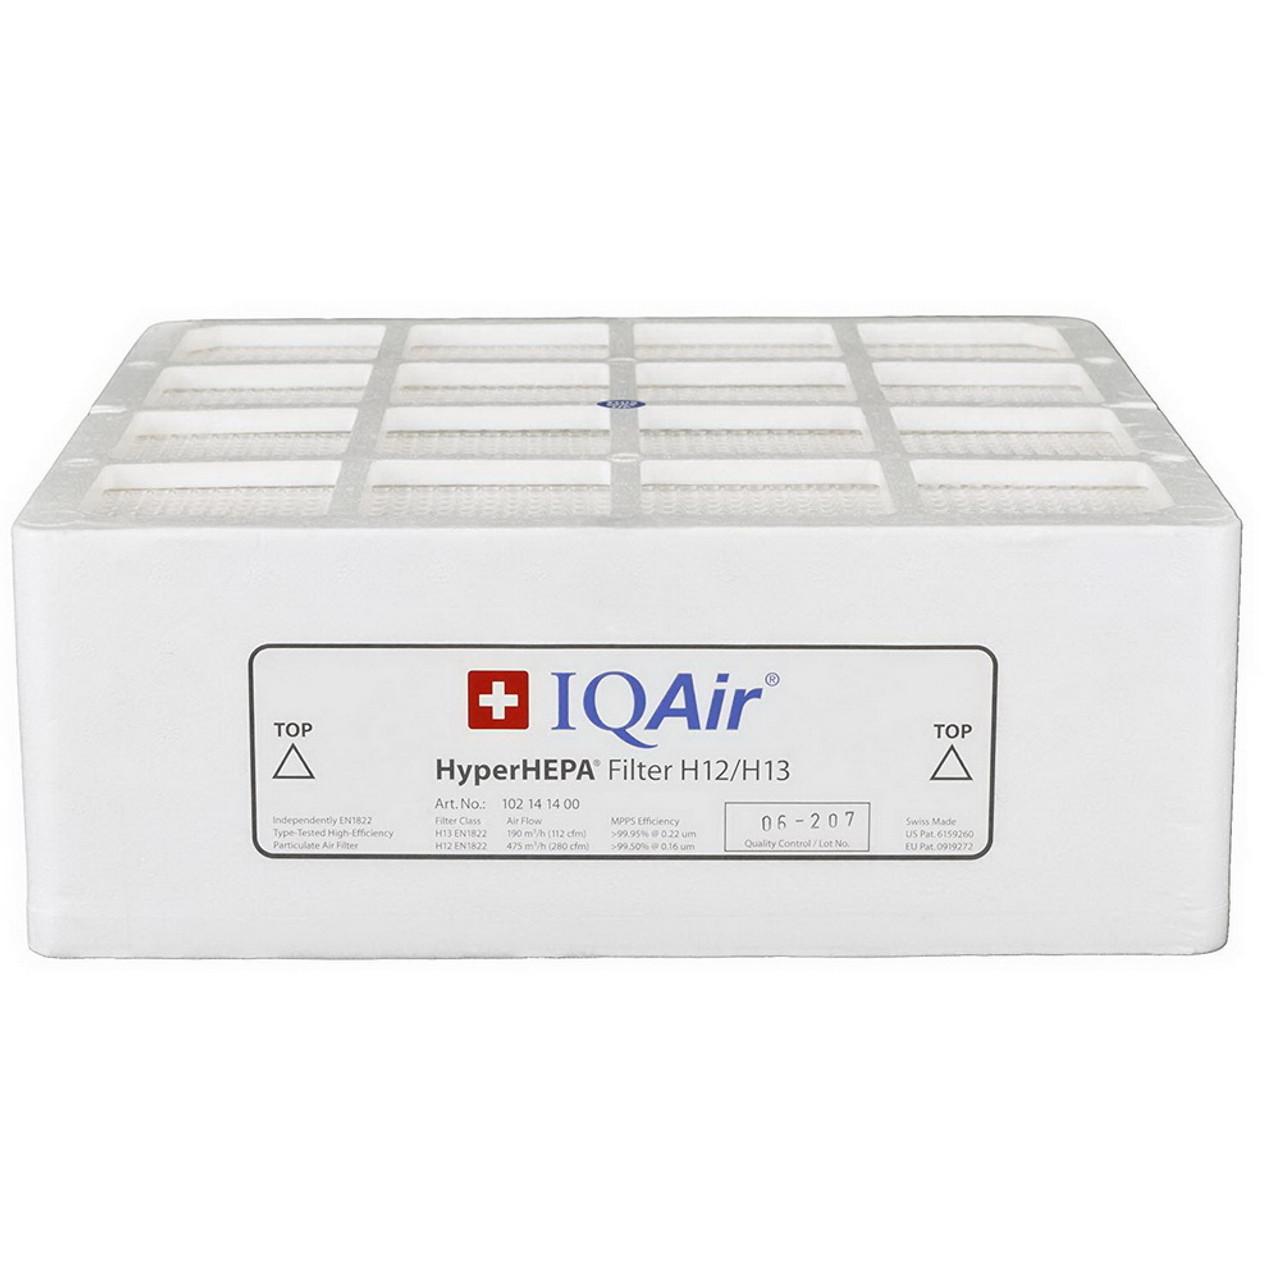 Iq Air Filters >> Iq Air Health Pro Plus Hyper Hepa Filter